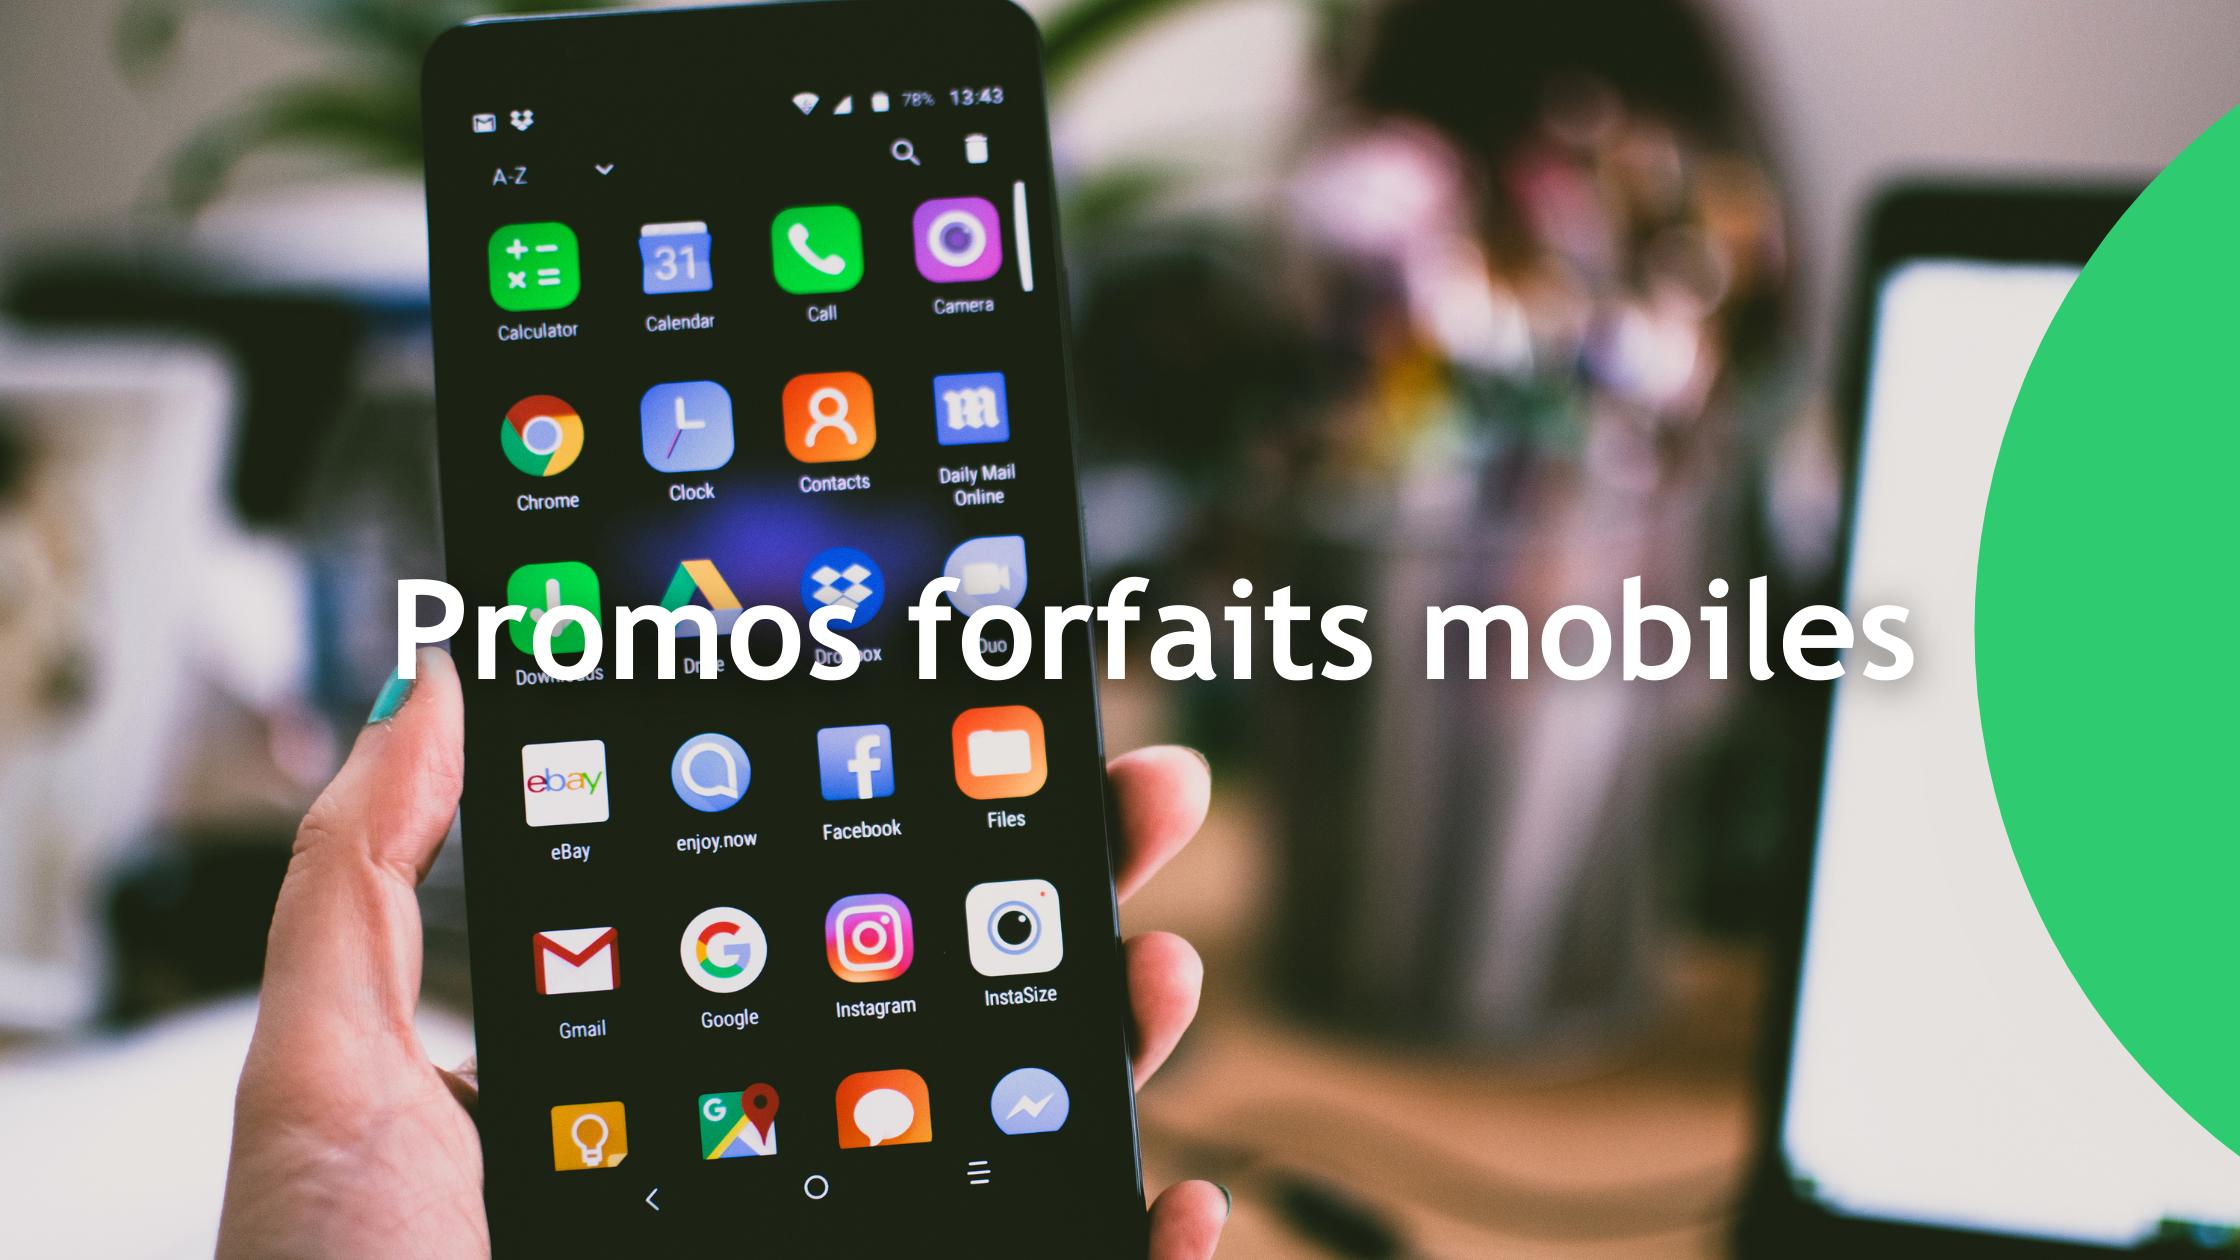 promos forfaits mobiles